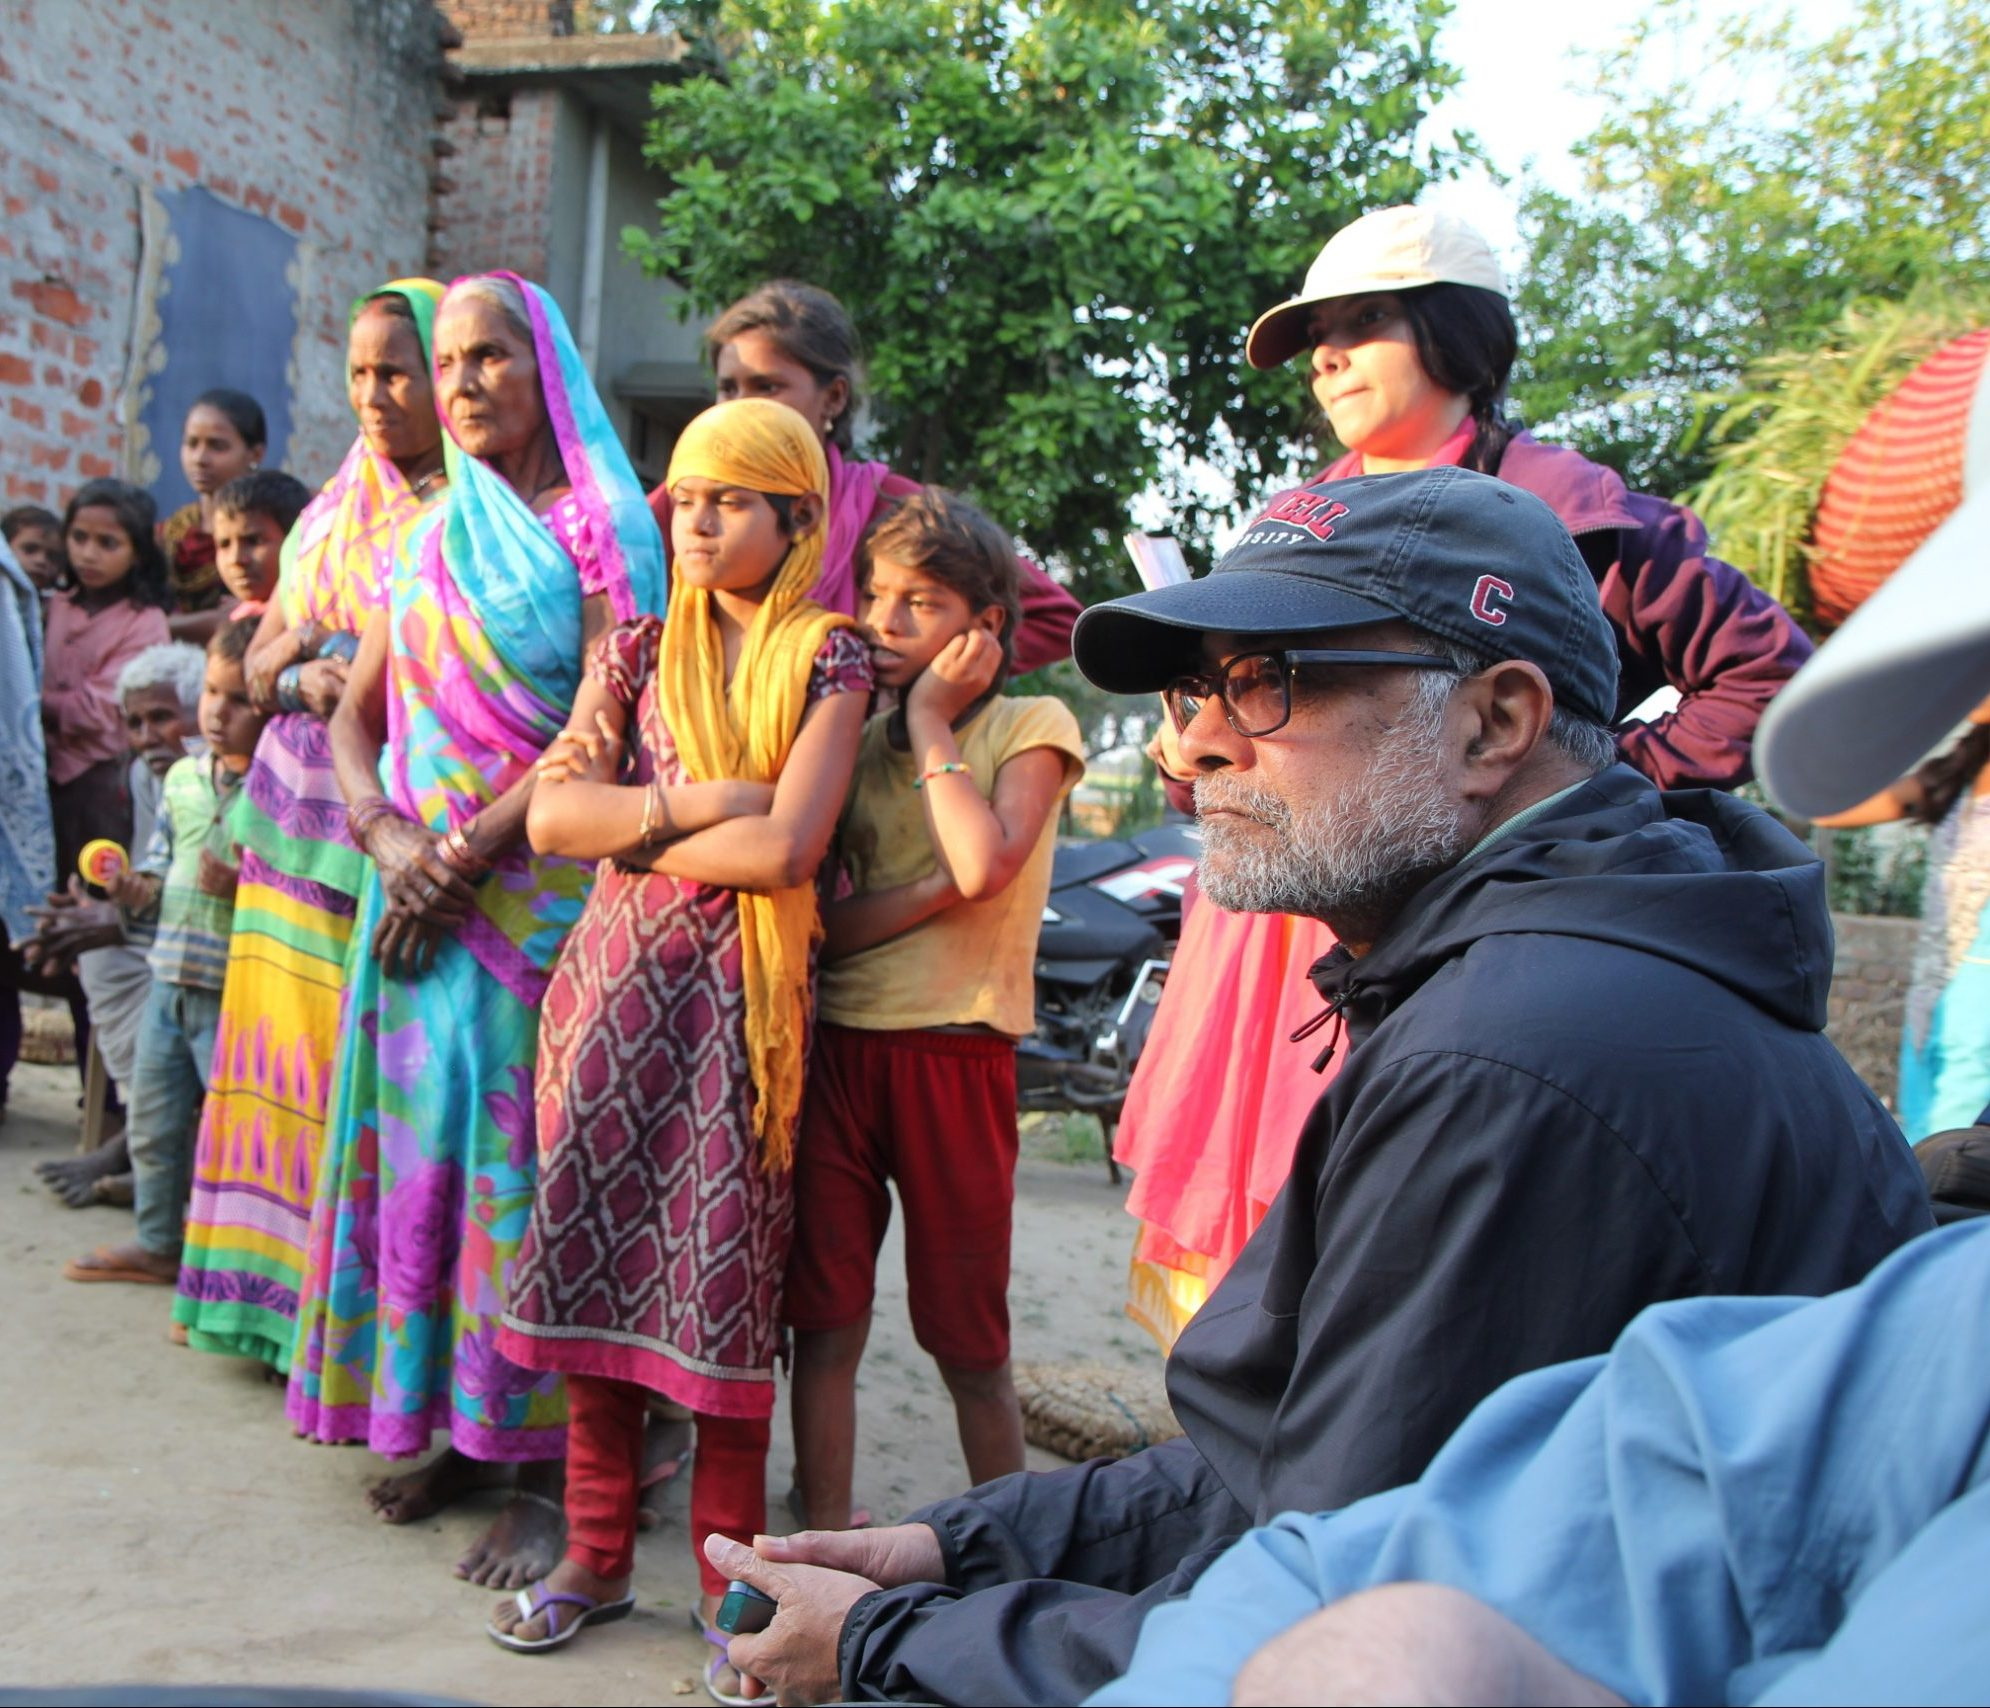 Prabhu Pingali and others standing outside